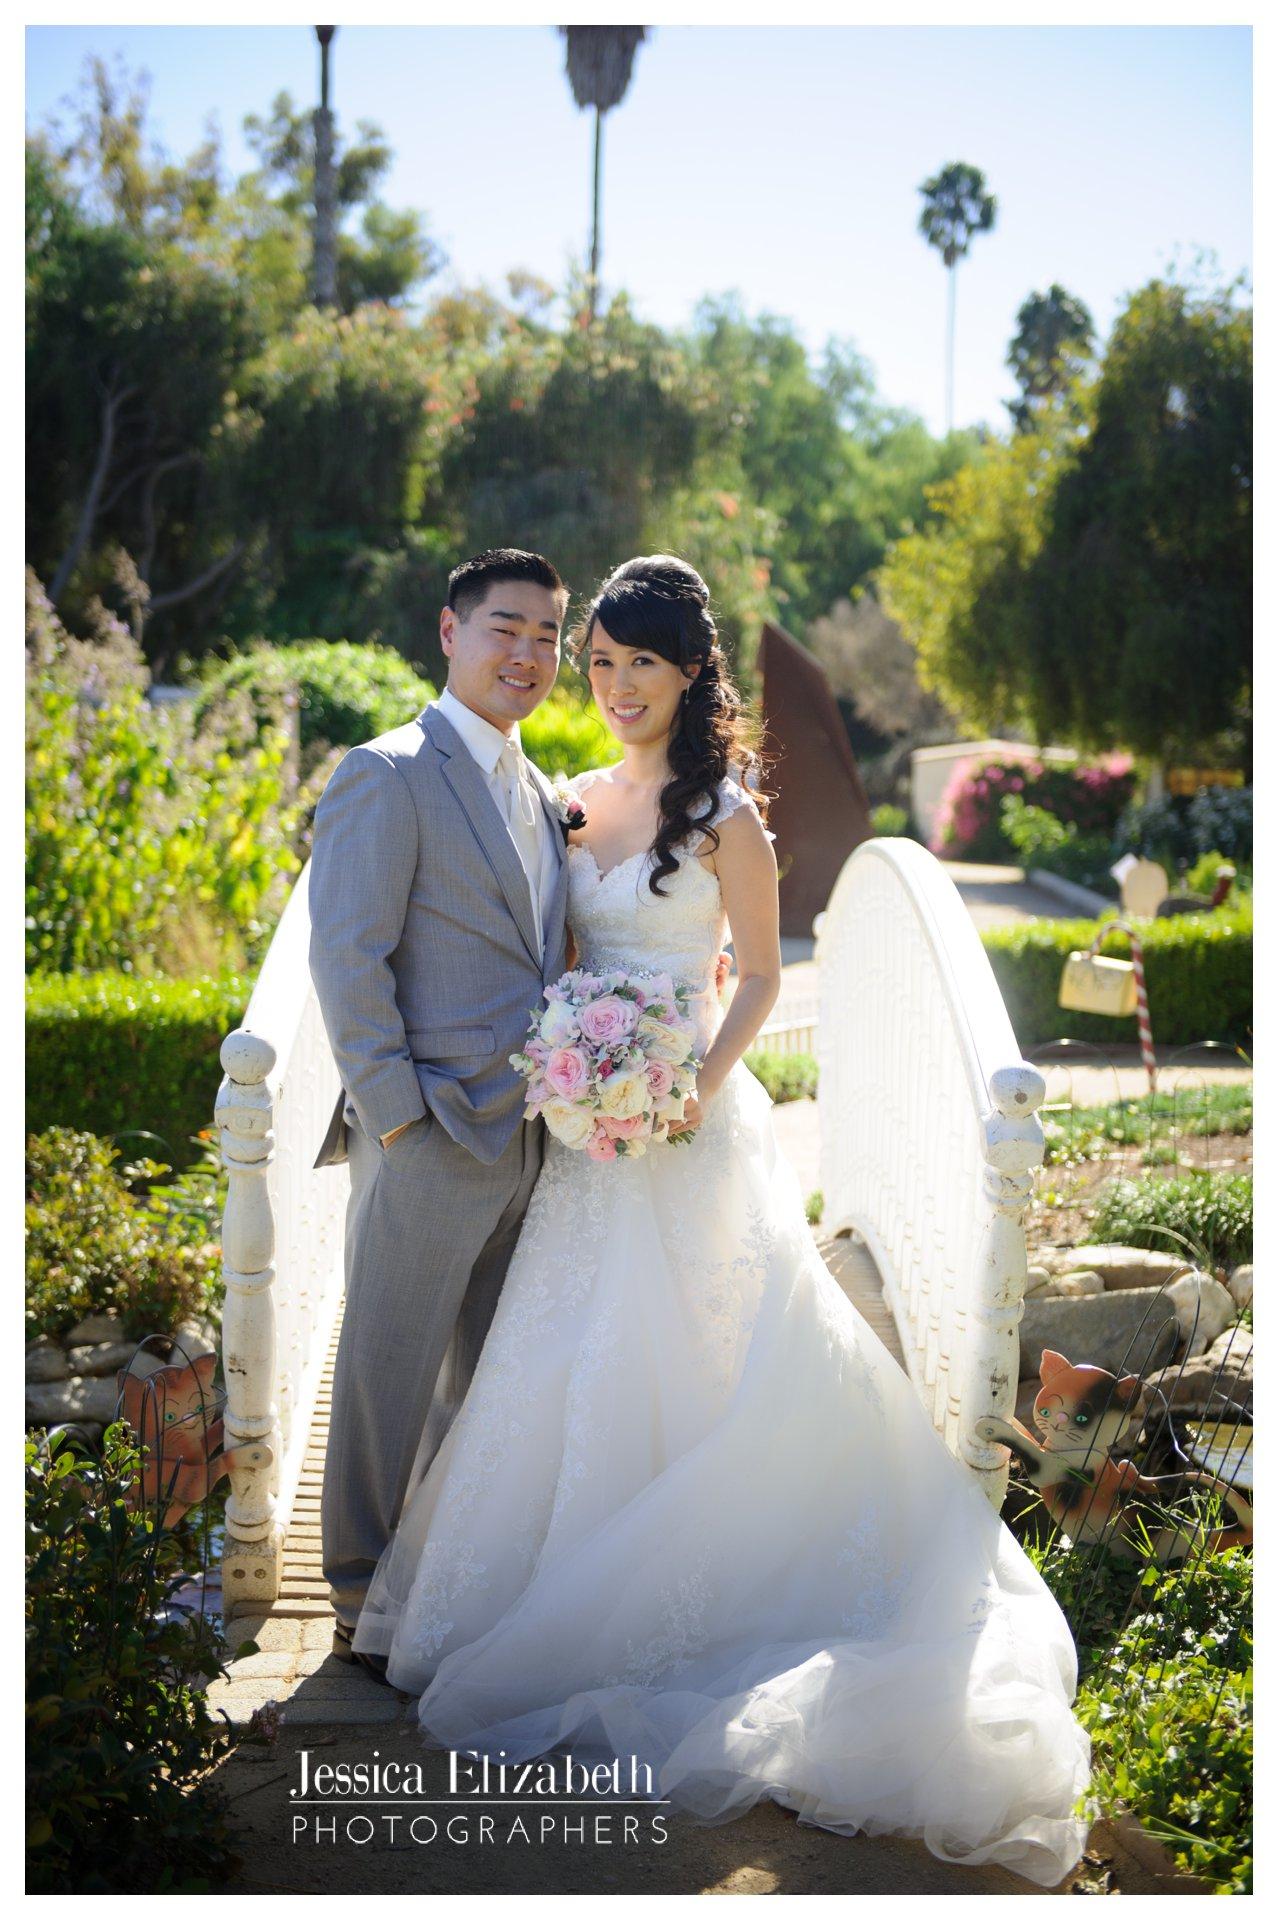 15-South Coast Botanic Garden Palos Verdes Wedding Photography by Jessica Elizabeth